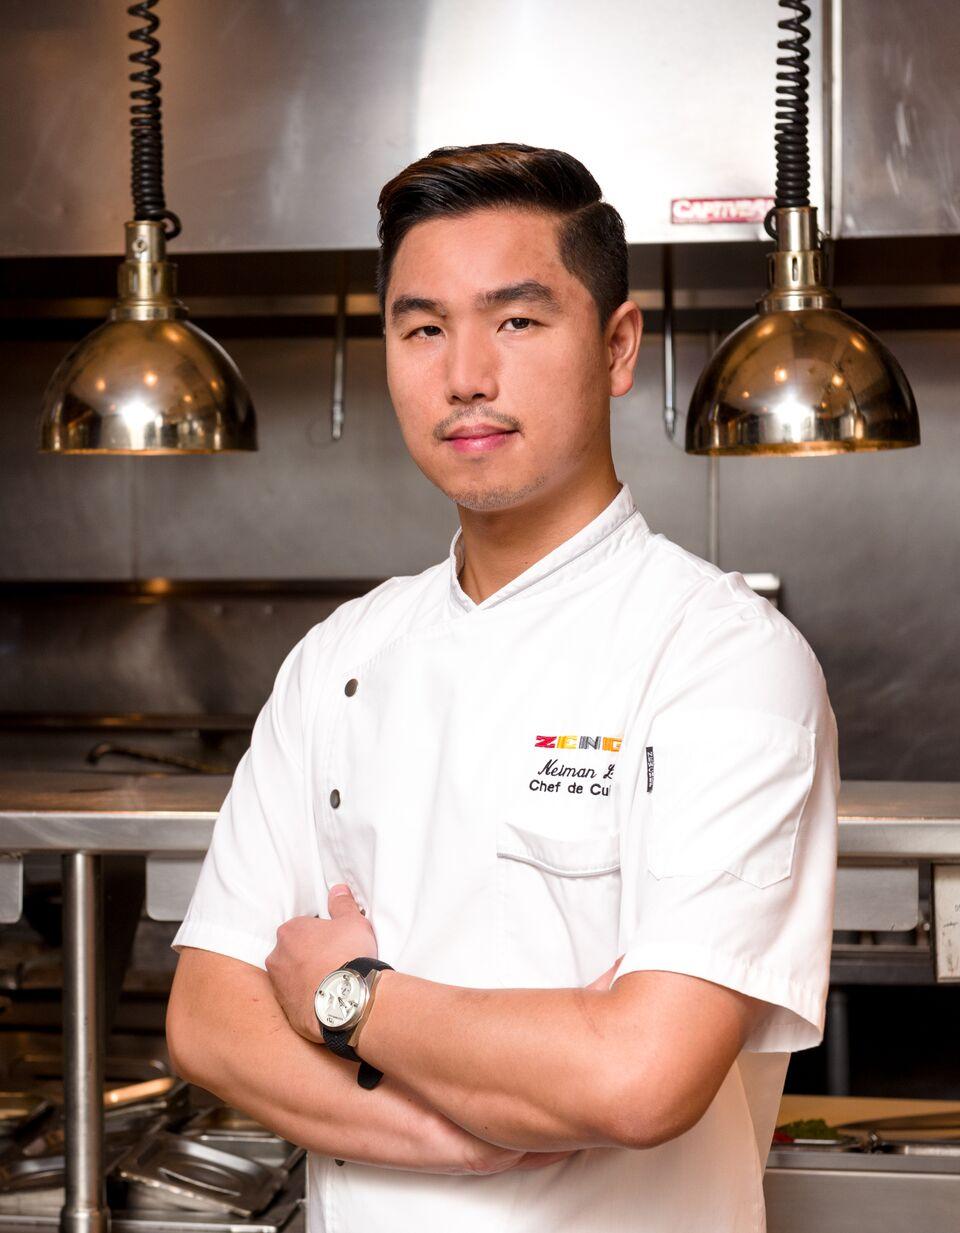 Celebrity Chef Richard Sandoval Names Neiman Lee As Chef